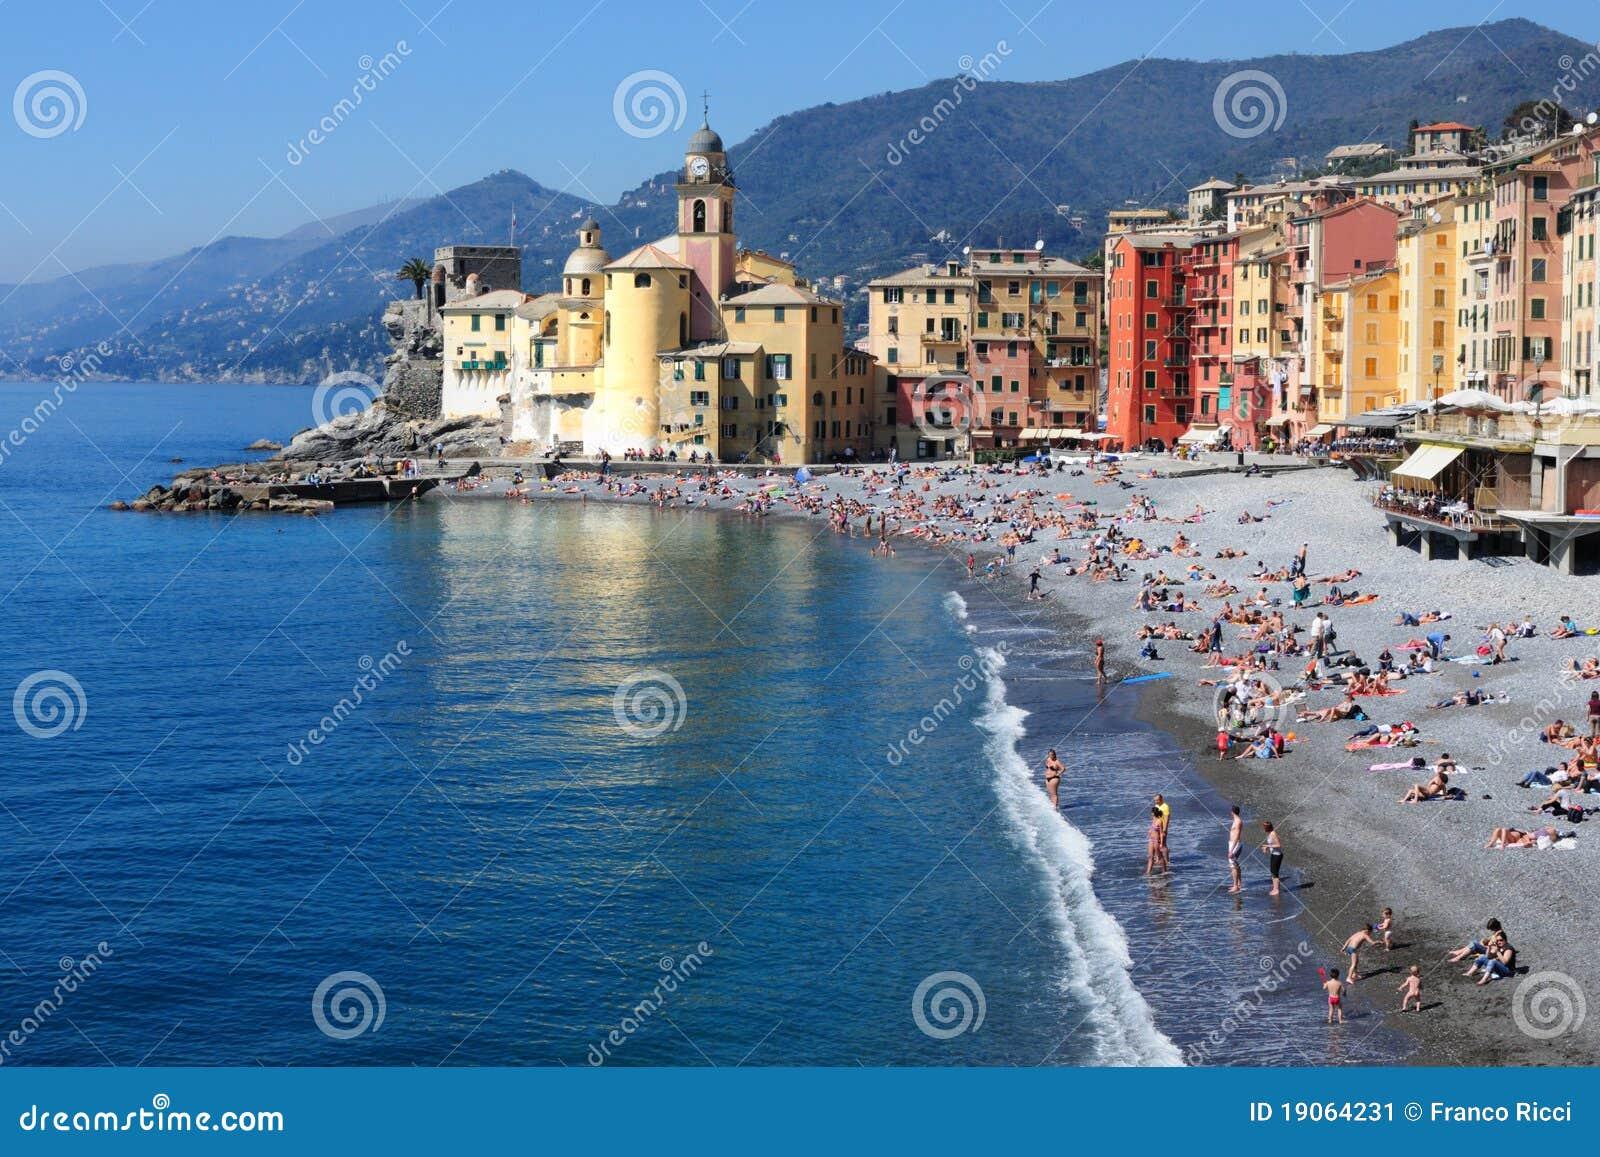 Préférence Le Golfe Et La Plage De Camogli Italie Image stock - Image: 19064231 CP95